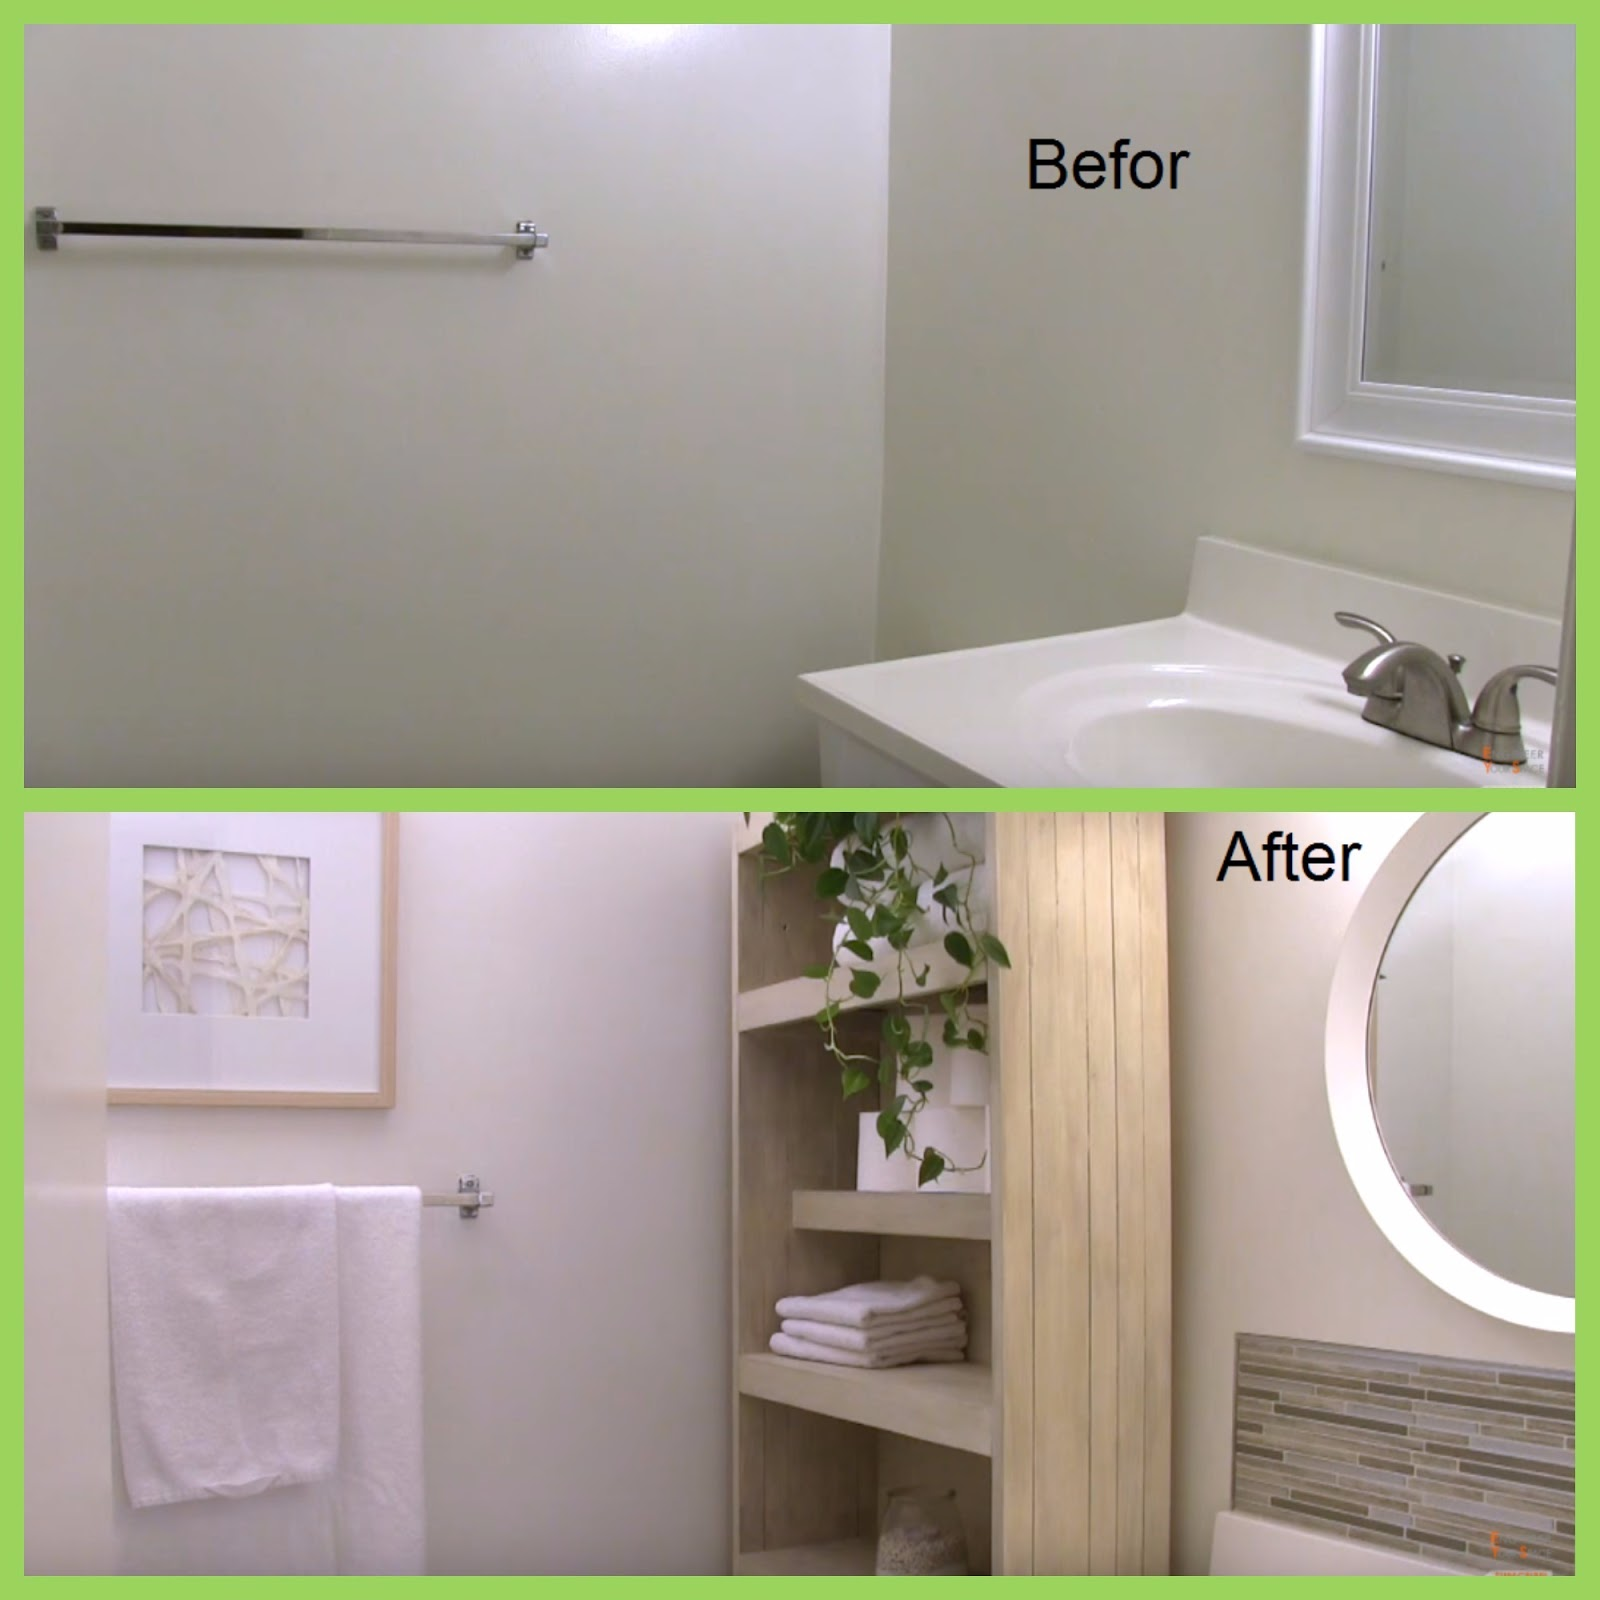 Average Labor Cost For Bathroom Remodel: Bathroom Remodel Ideas